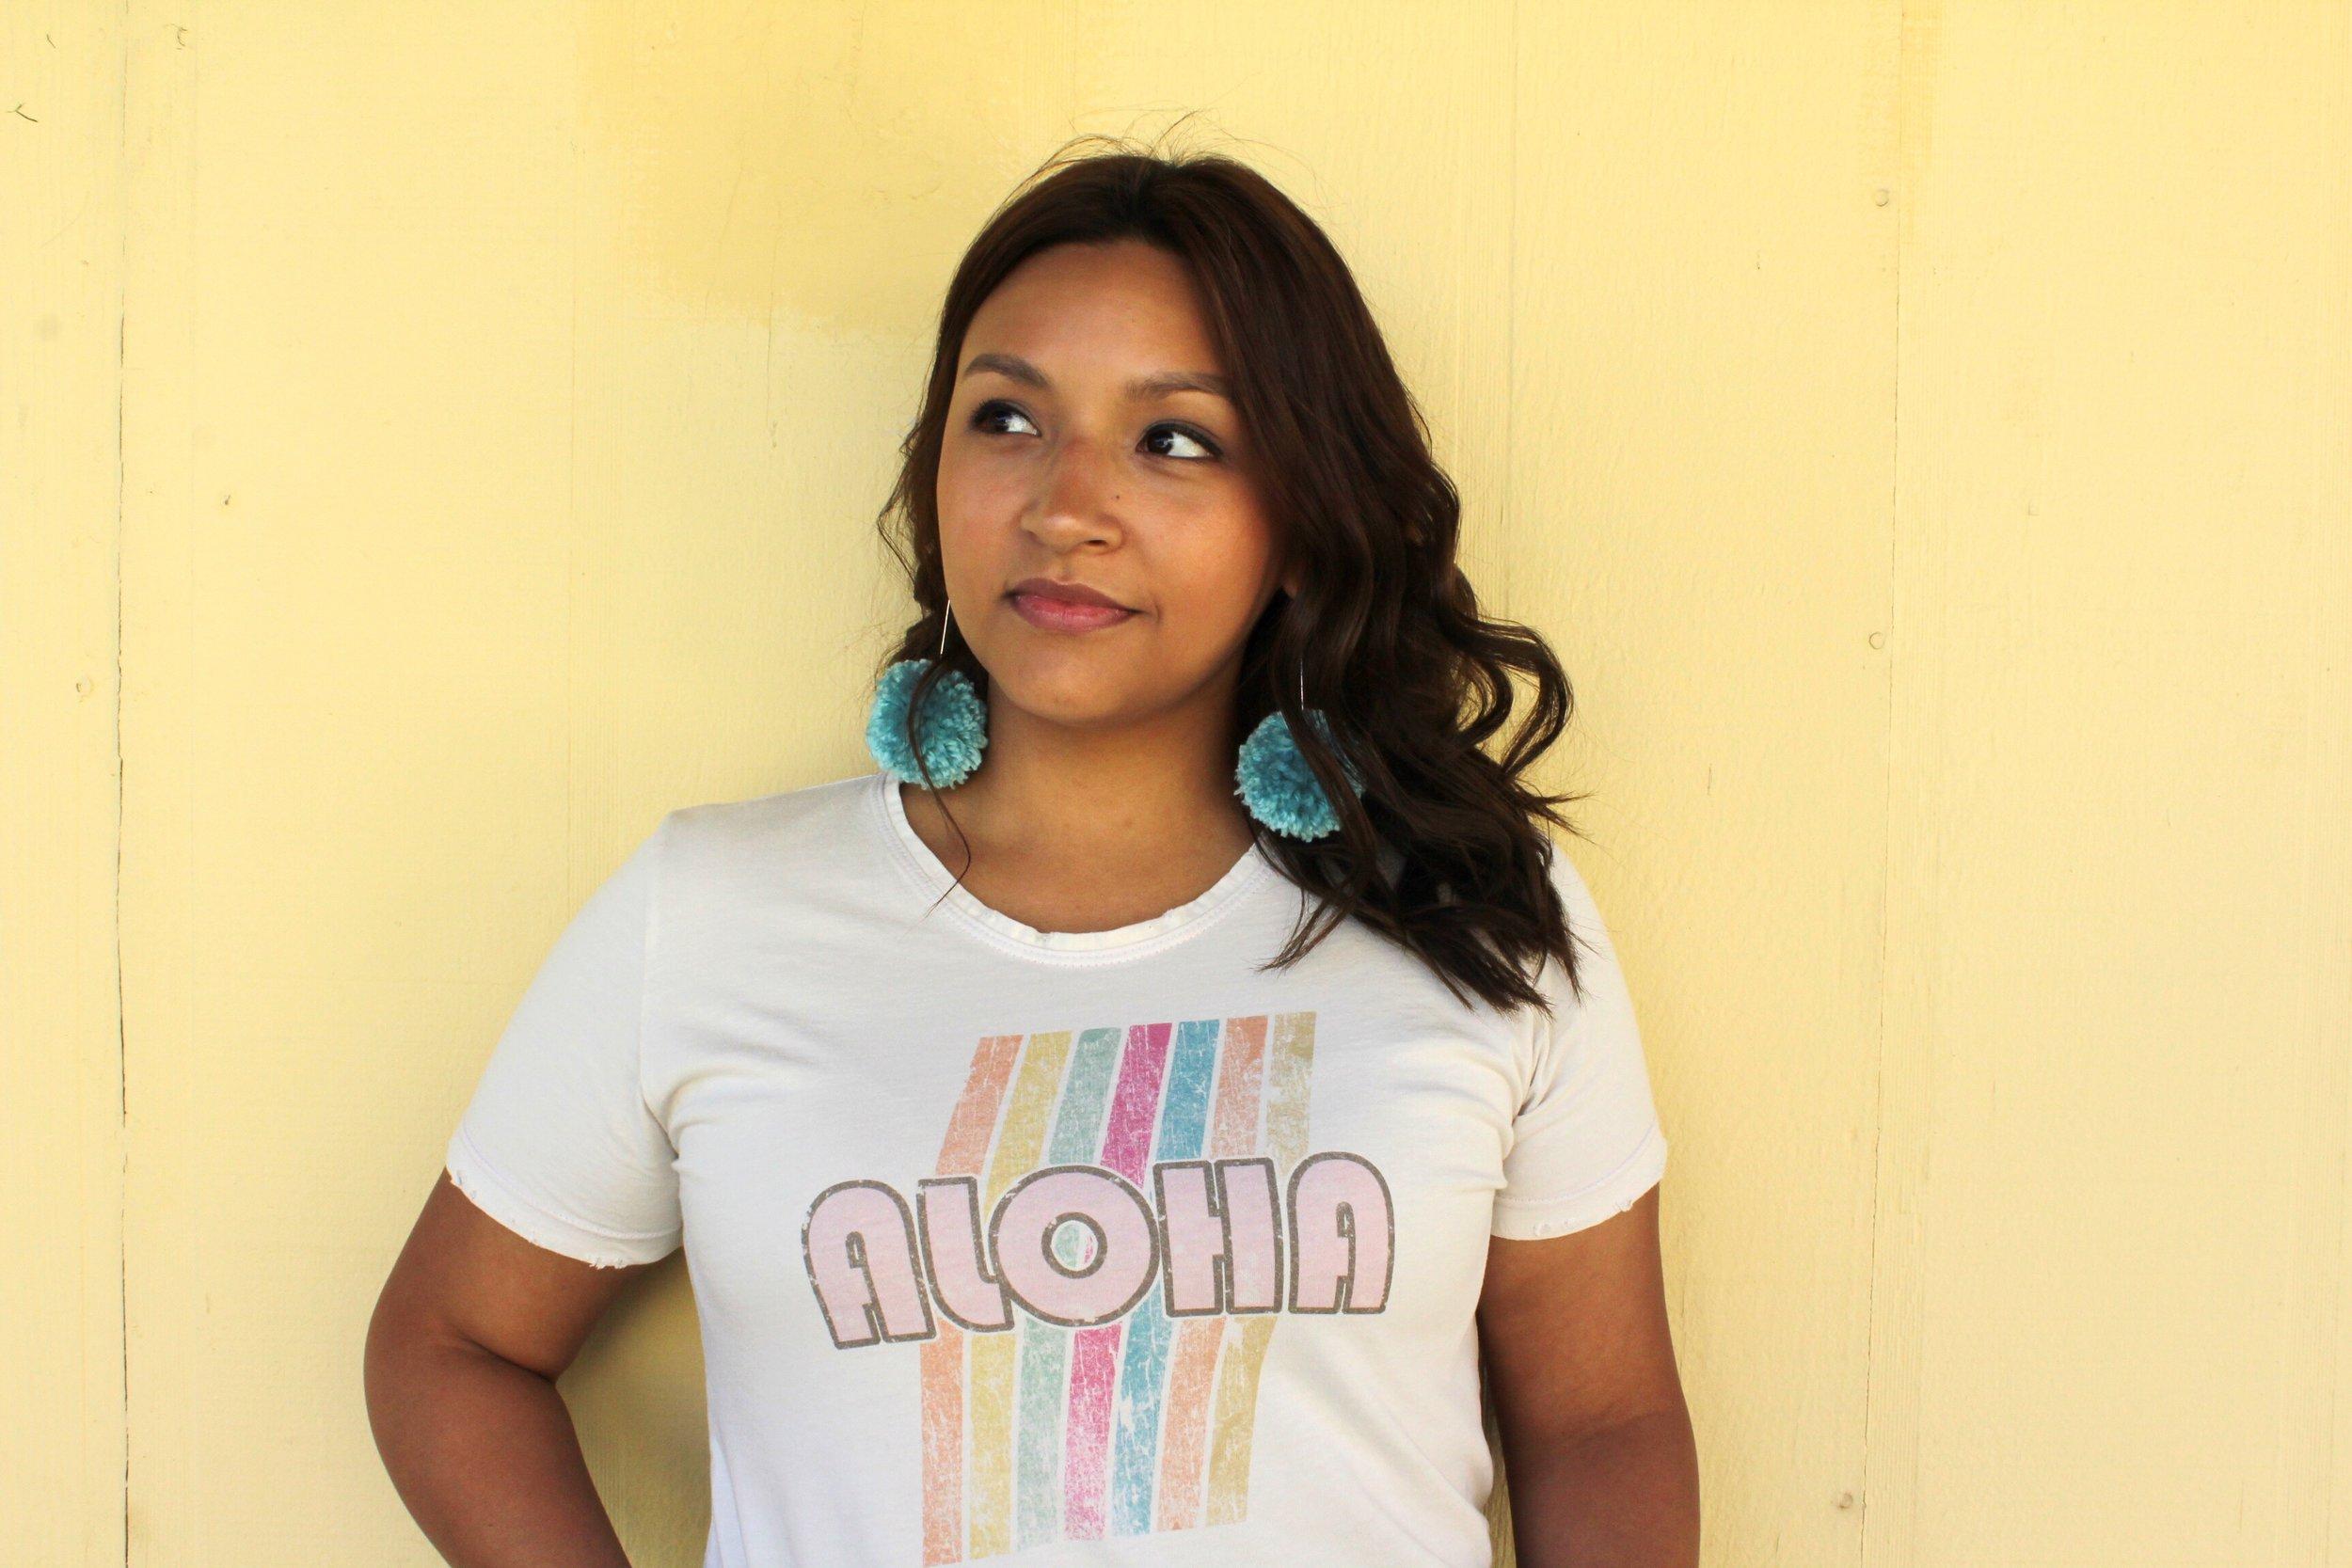 Dolkii Rainbow Aloha Distressed Tee and Wavy Hair